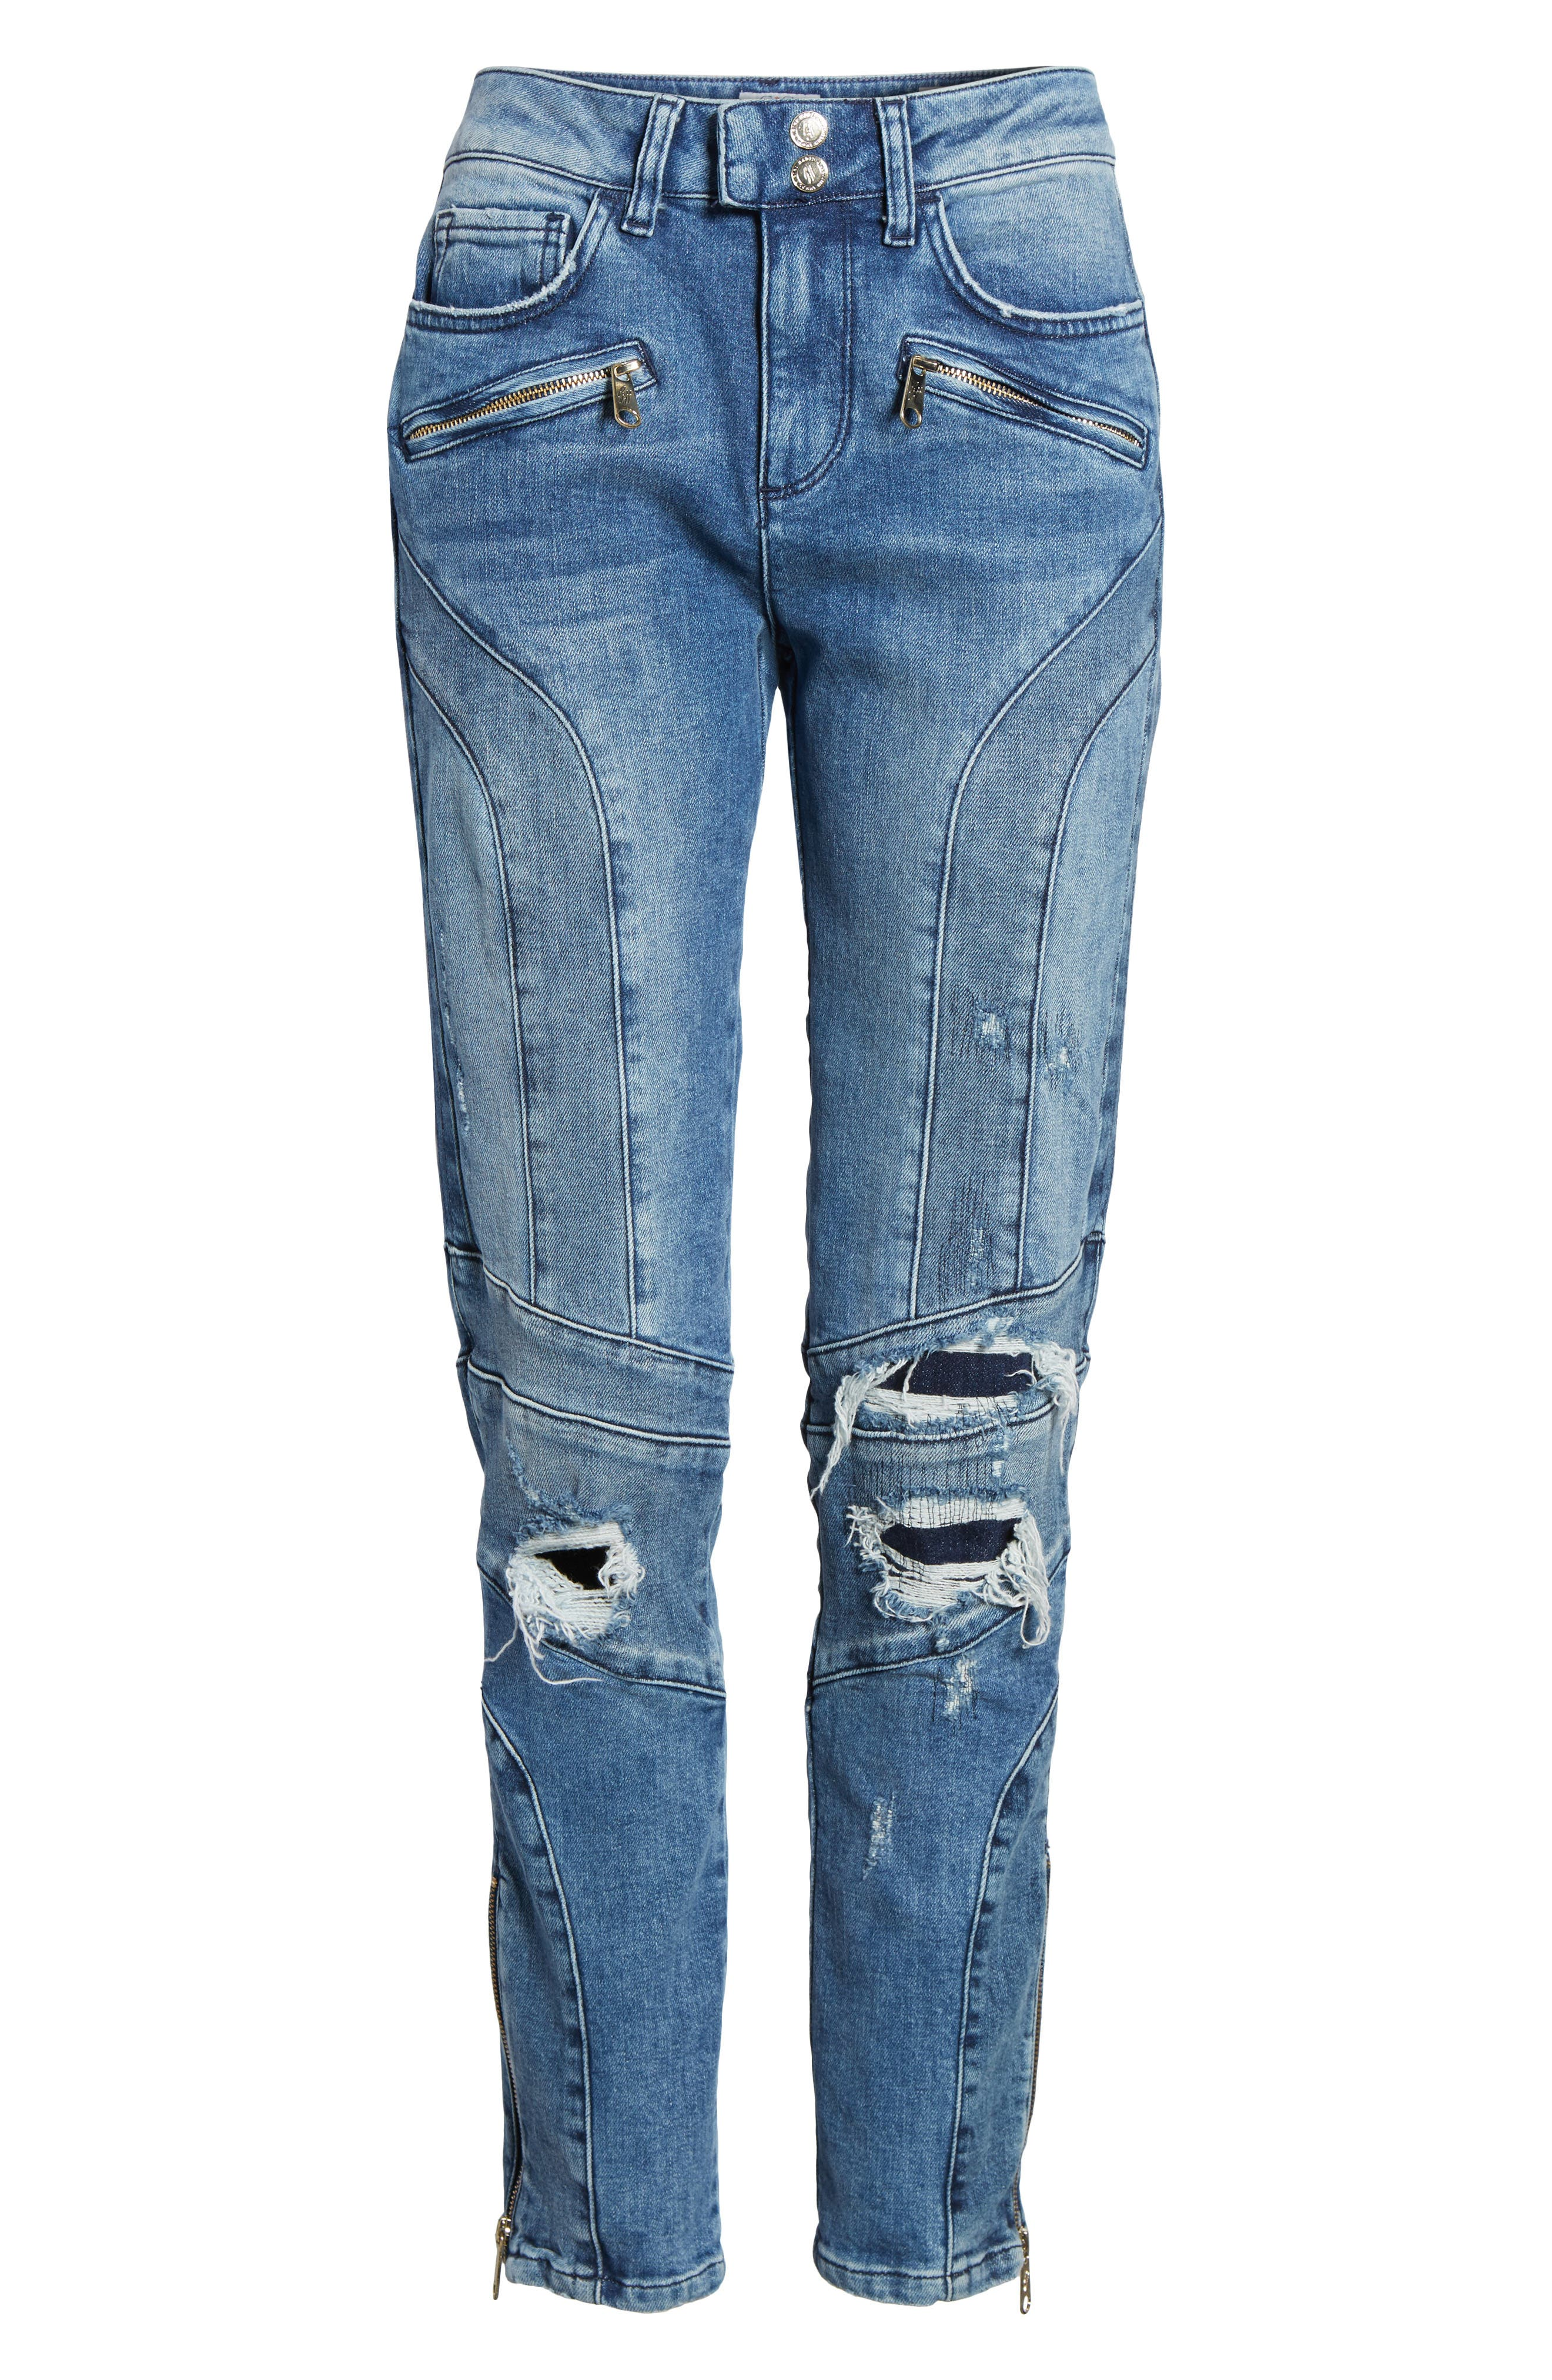 x Gigi Hadid Speed Distressed Ankle Zip Jeans,                             Alternate thumbnail 6, color,